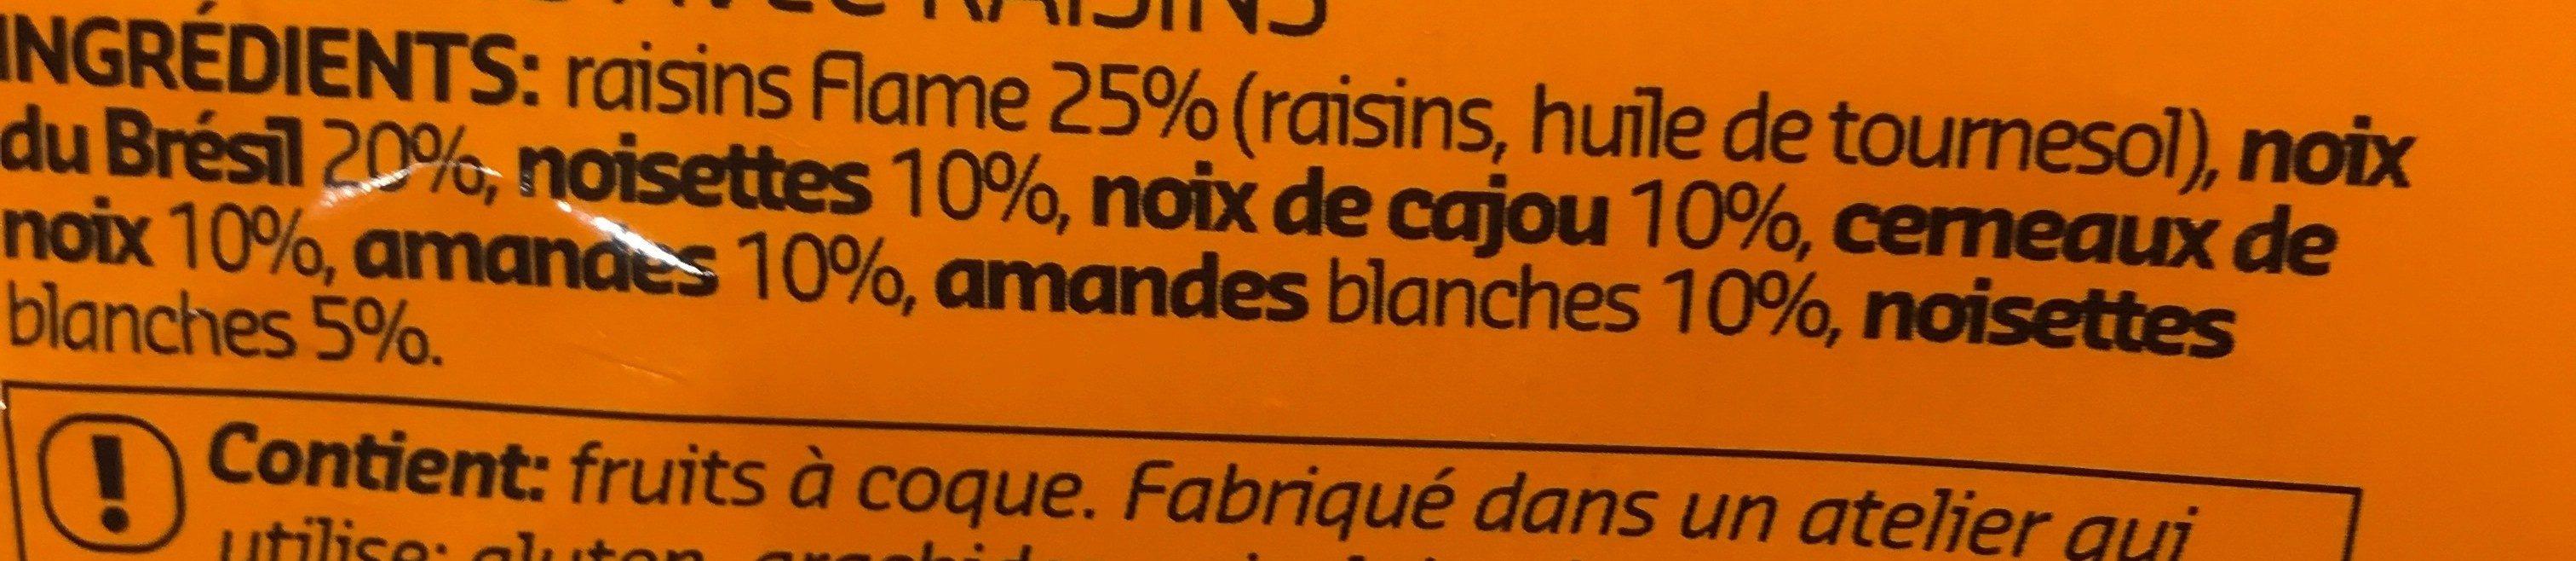 Mendiants Avec Raisins - Ingrediënten